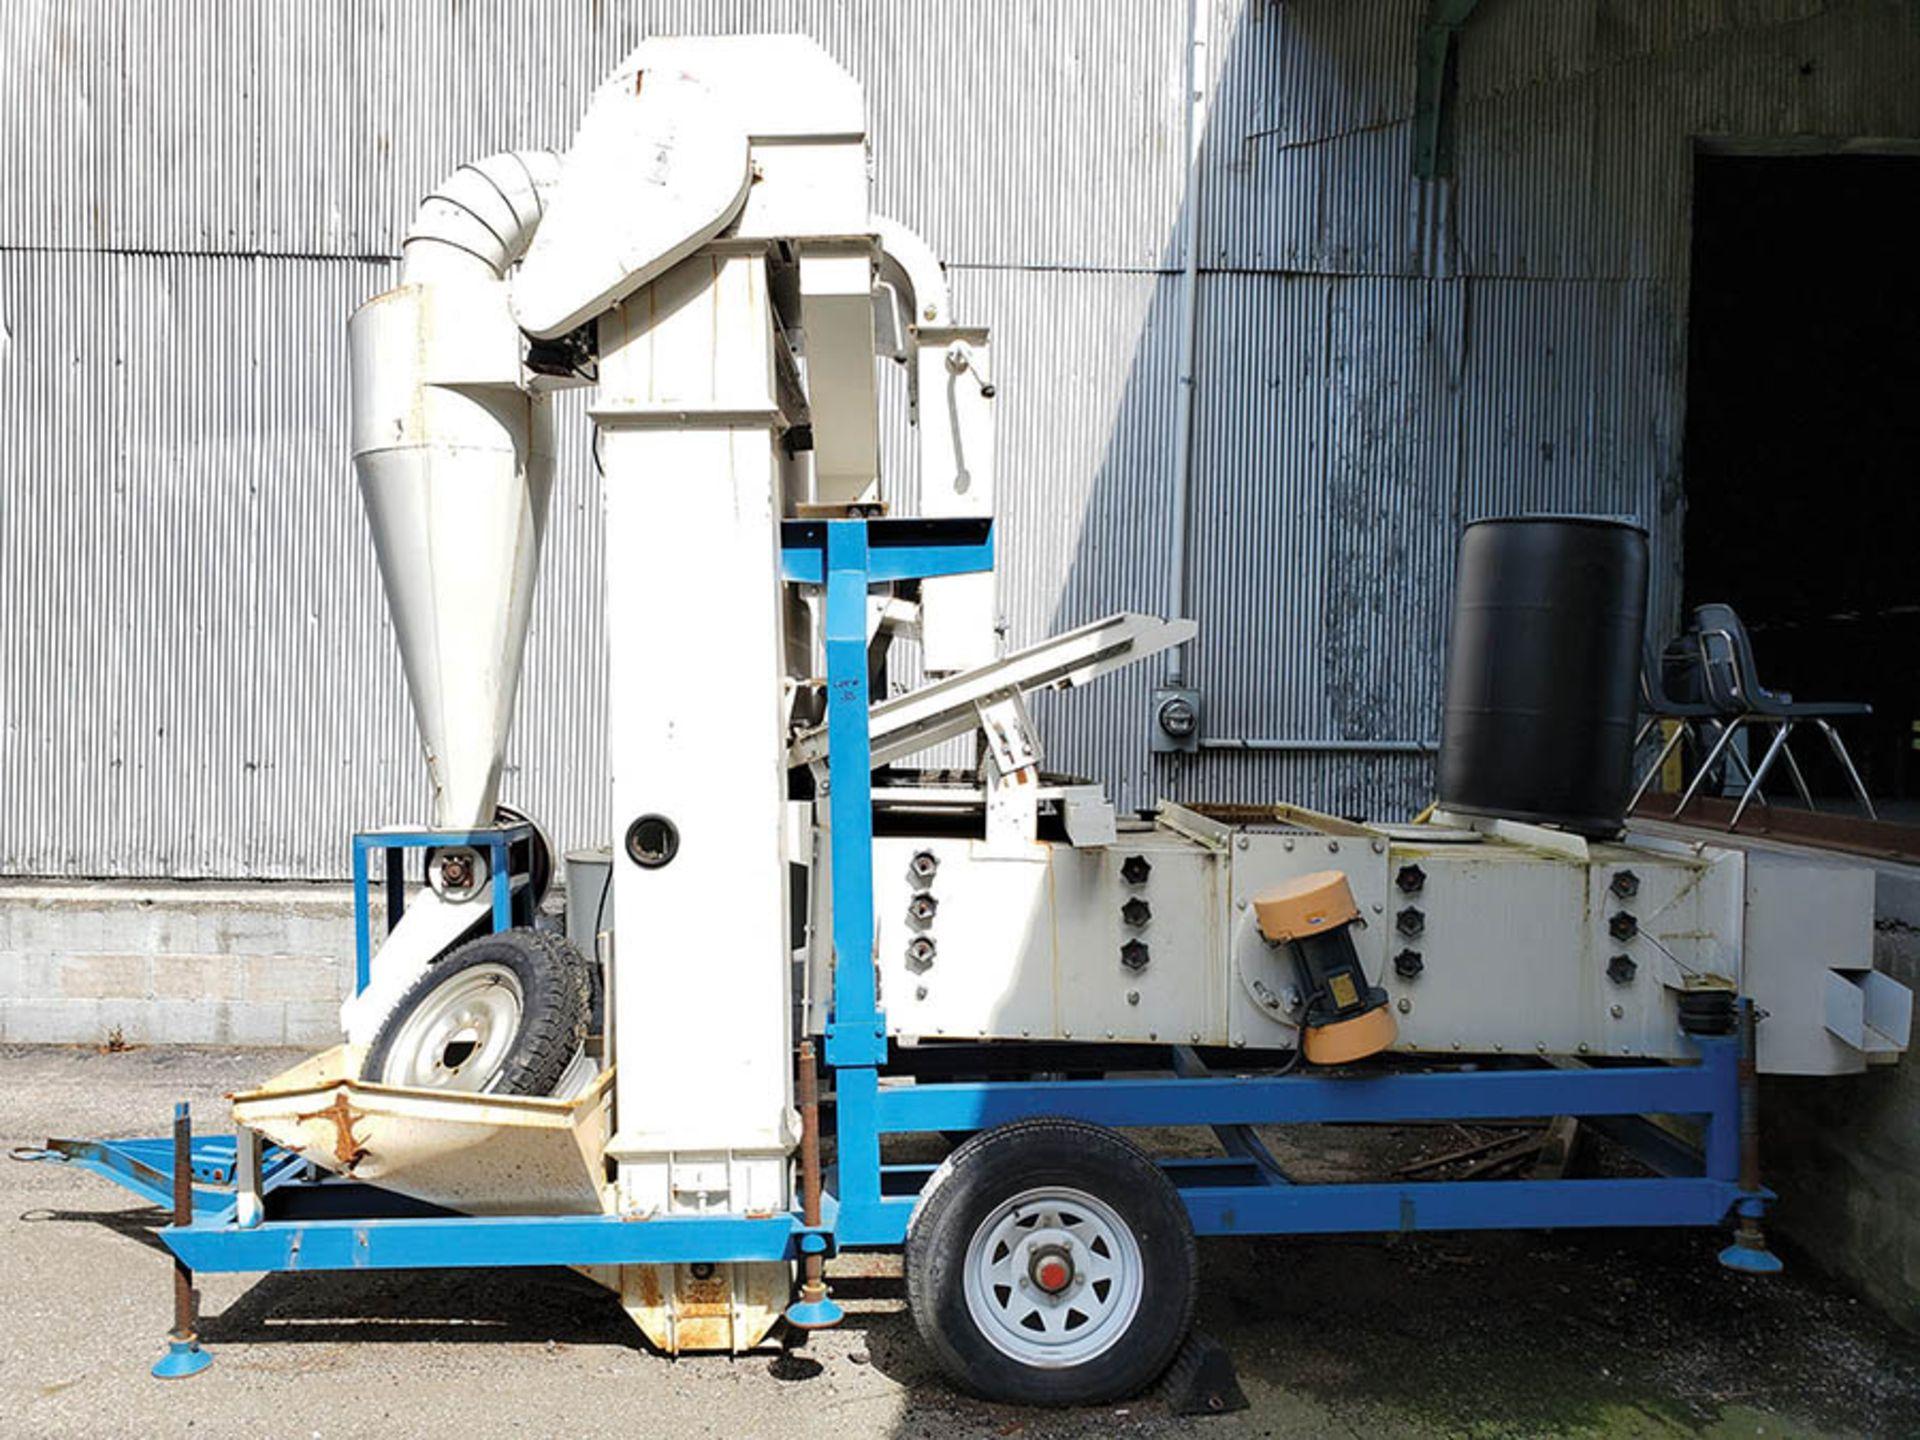 TOWABLE SYNMEC SHAKER SEED CLEANER & GRADER, HEMP STEM/SEED SEPARATOR, 3 STATION, MODEL 5X2F-7-5F, - Image 2 of 11